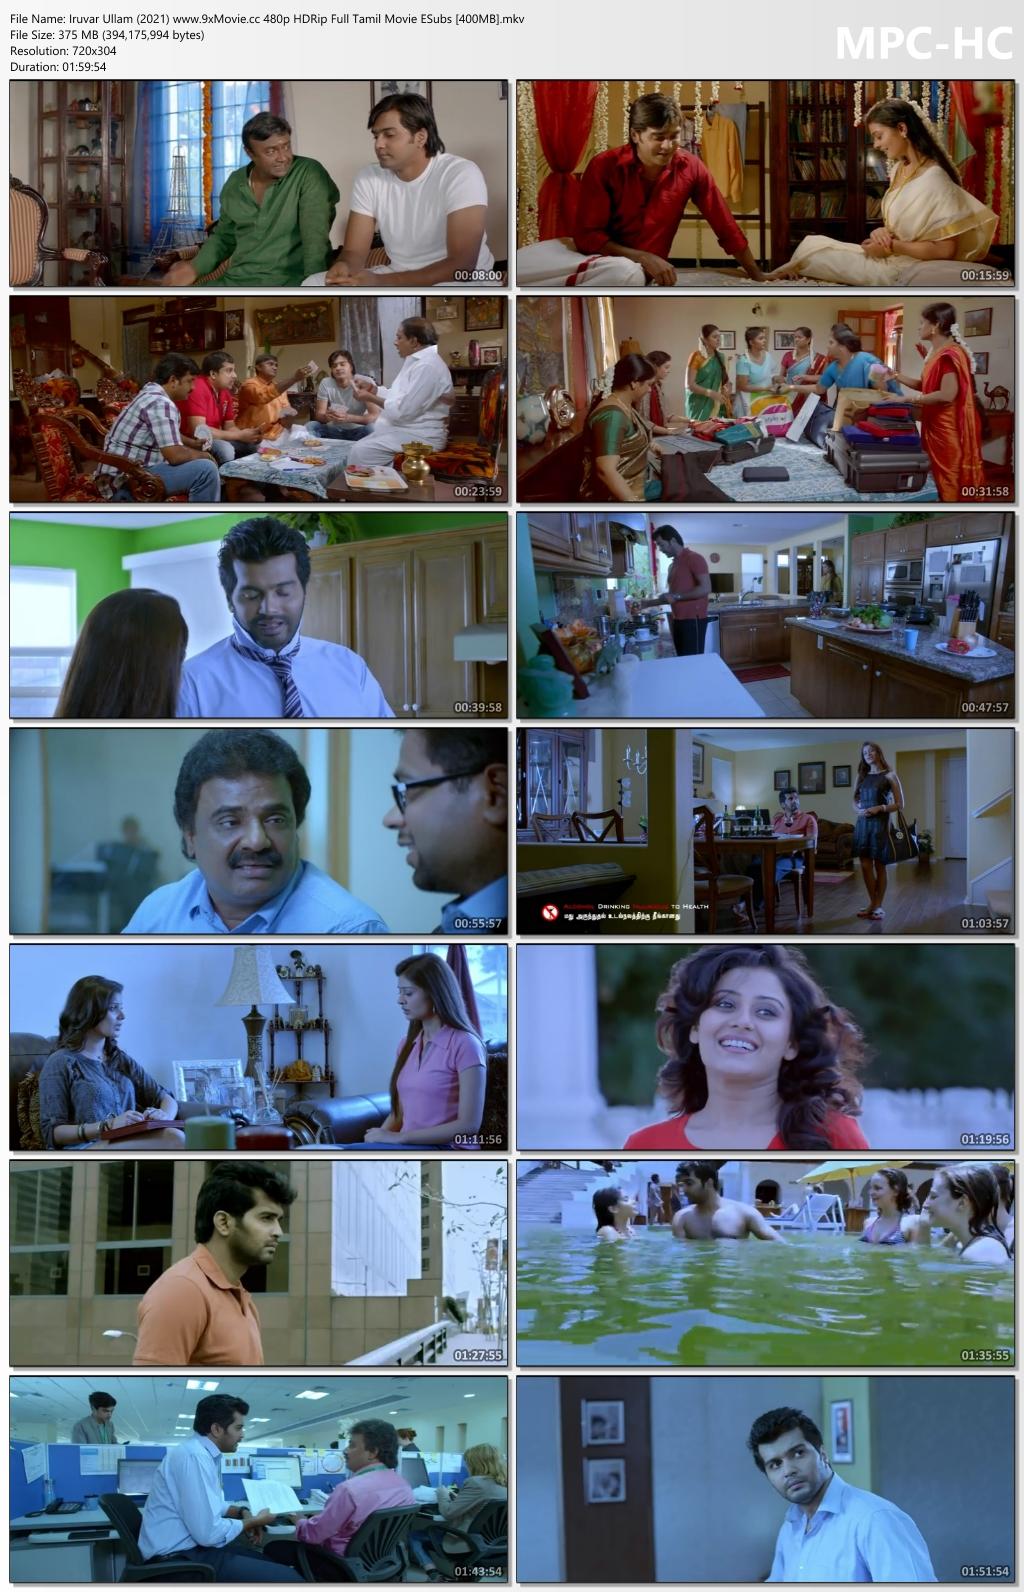 Iruvar-Ullam-2021-www-9x-Movie-cc-480p-HDRip-Full-Tamil-Movie-ESubs-400-MB-mkv